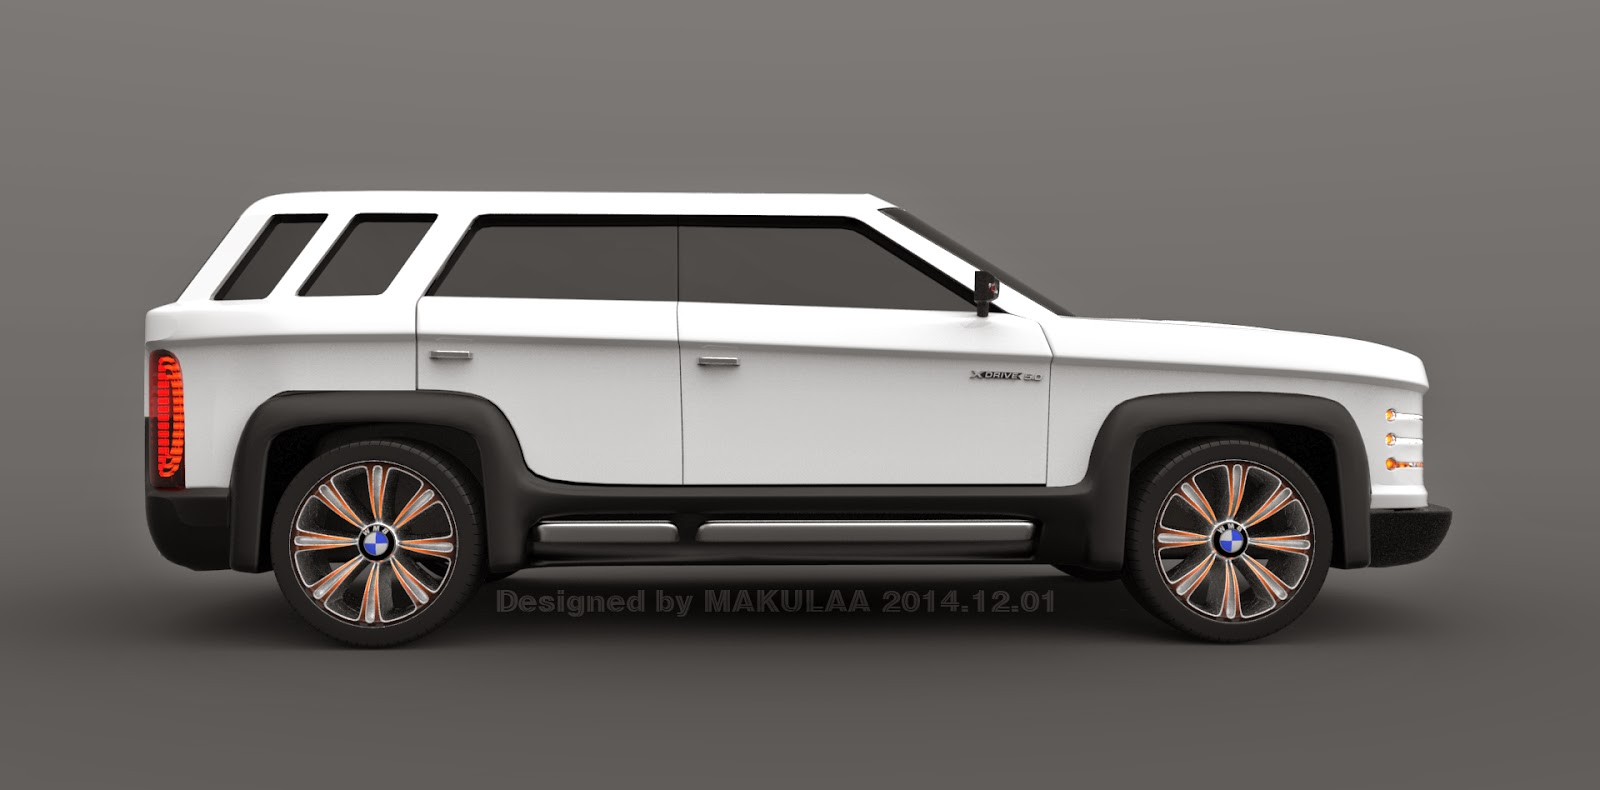 Car Design Creator By Makulaa Bmw X7 Concept 2017